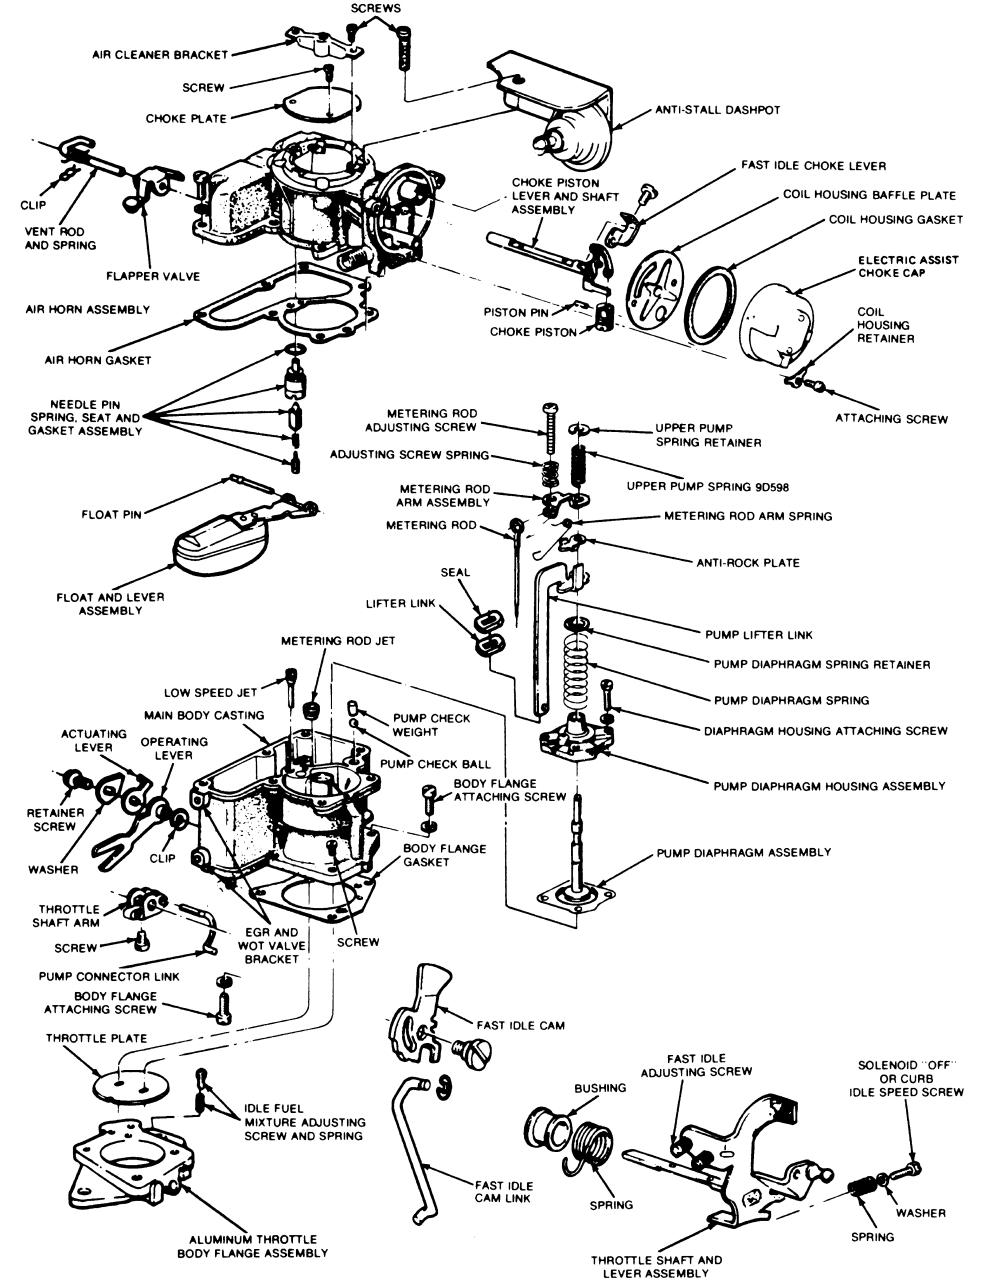 Ford F150 Carburetor Diagram Wiring Diagrams Arch Manage A Arch Manage A Alcuoredeldiabete It